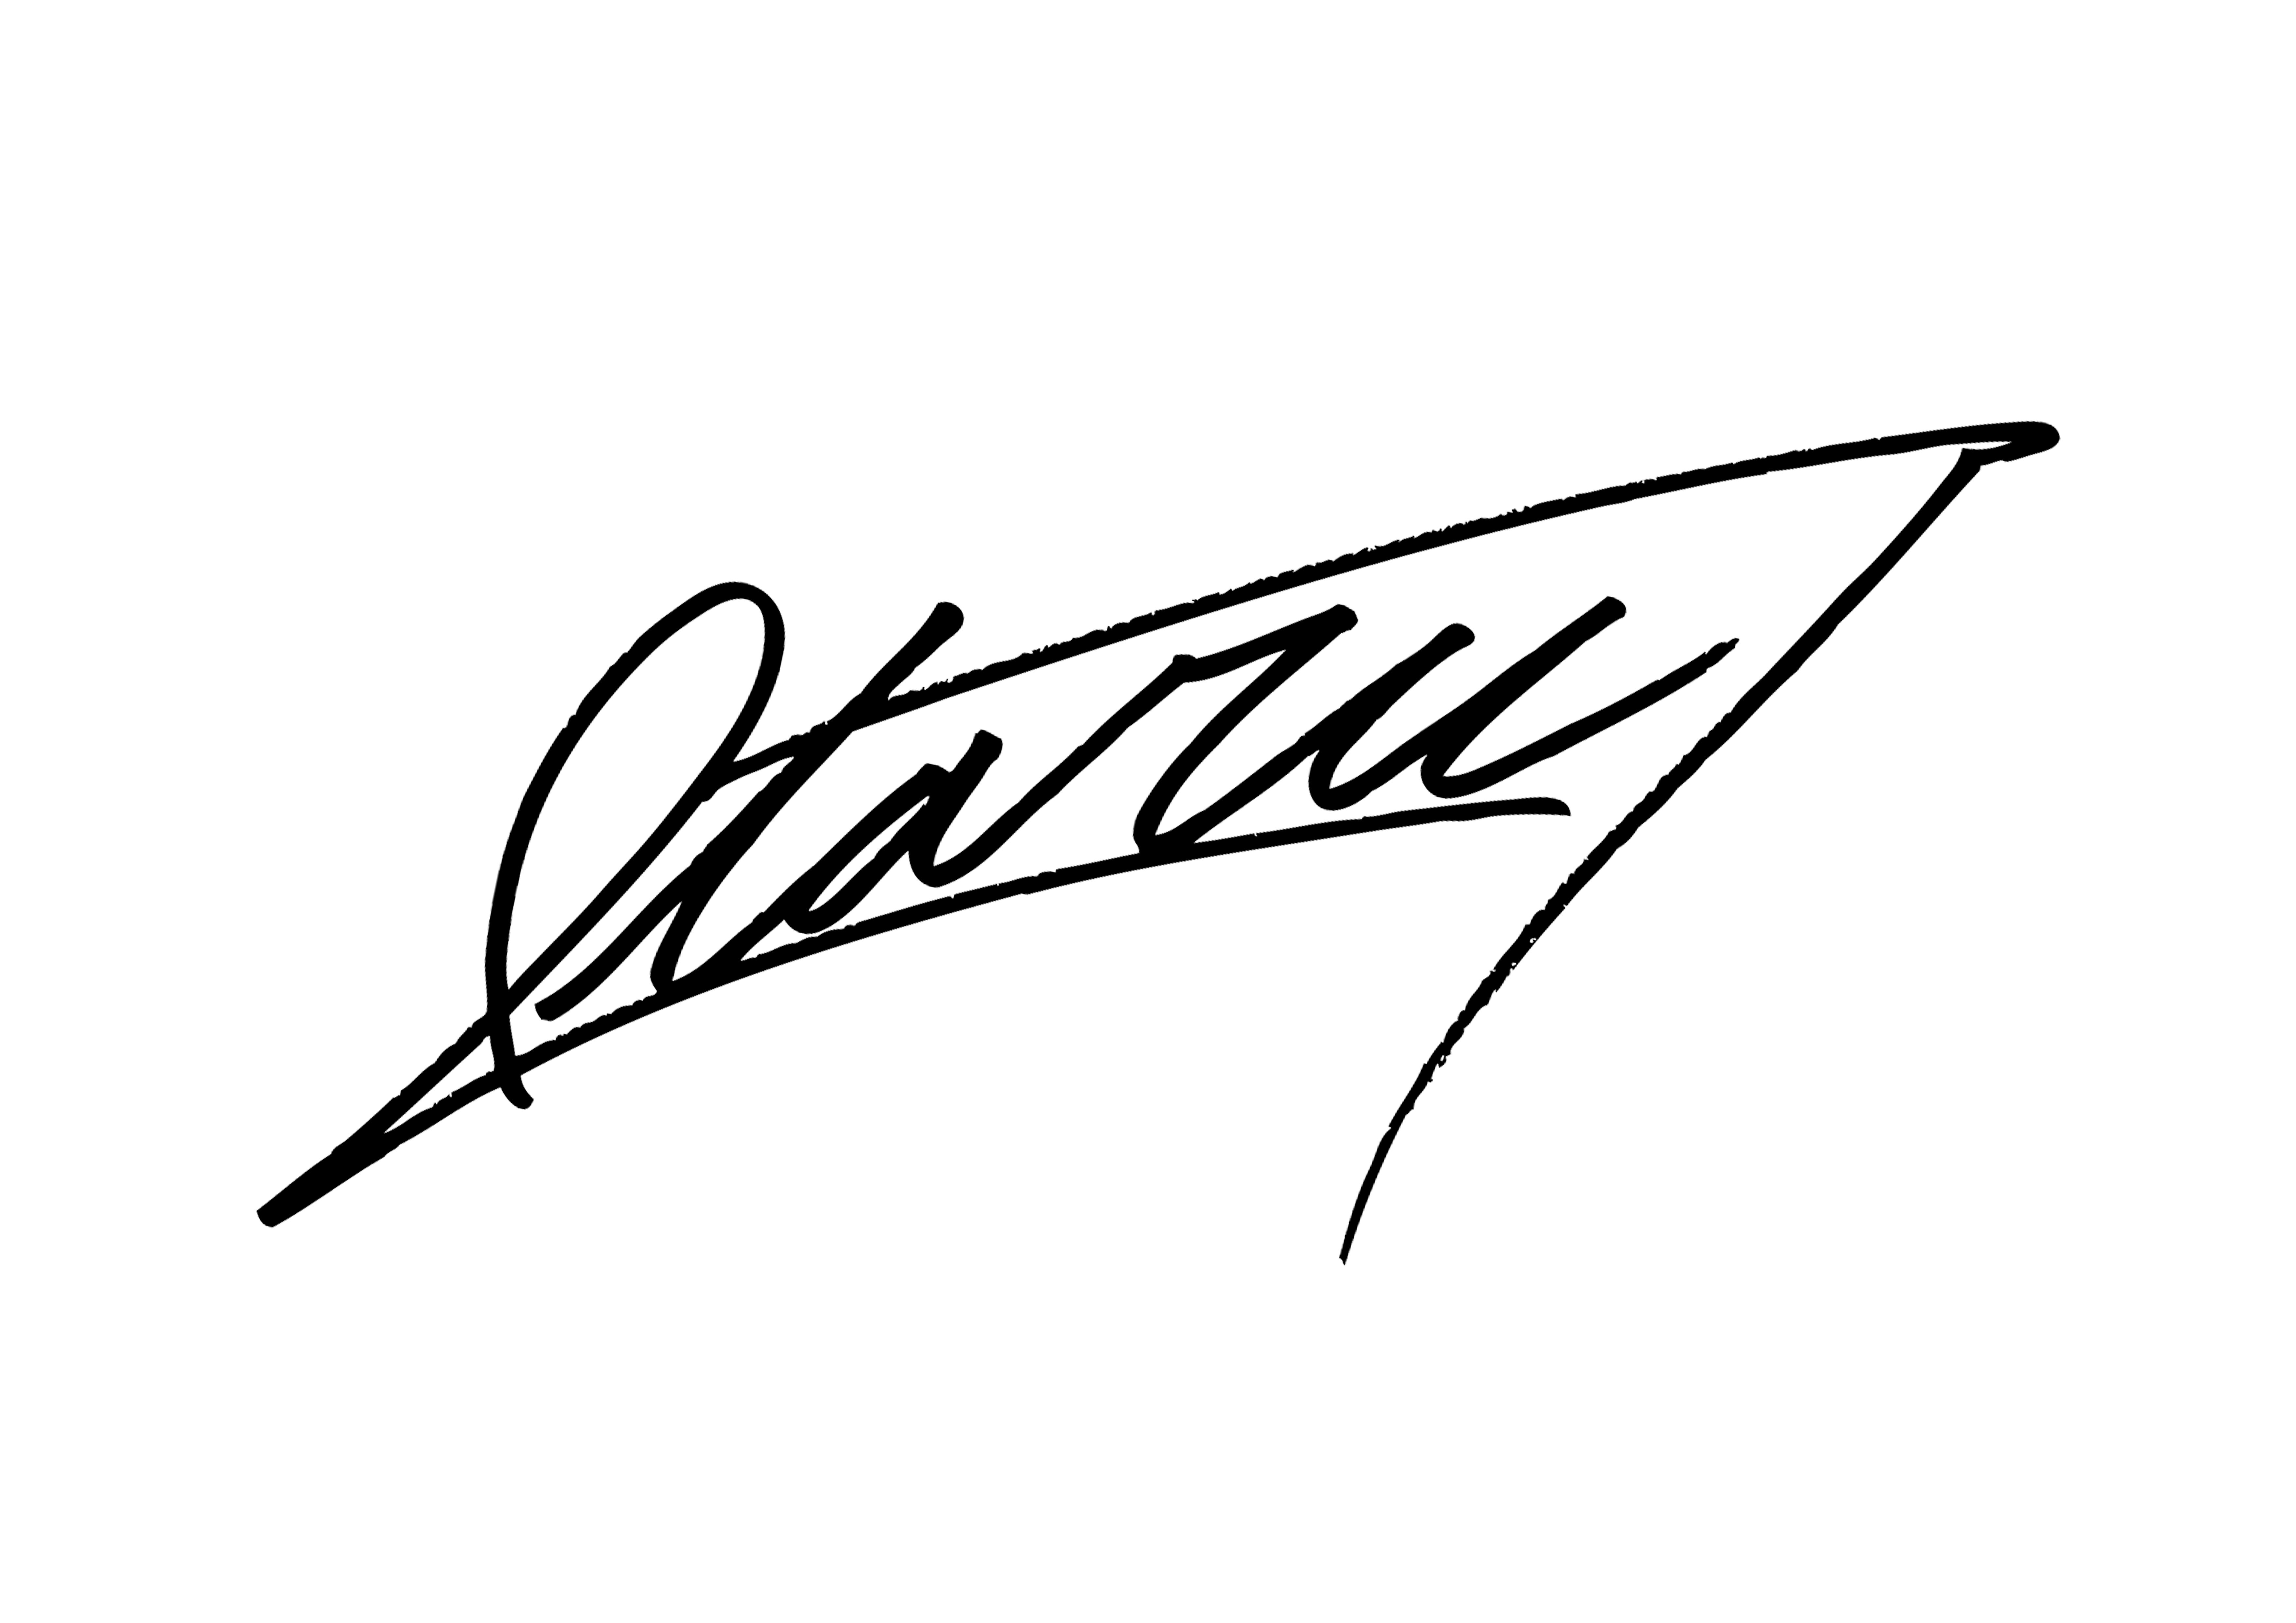 Itaru Tsubota's Signature